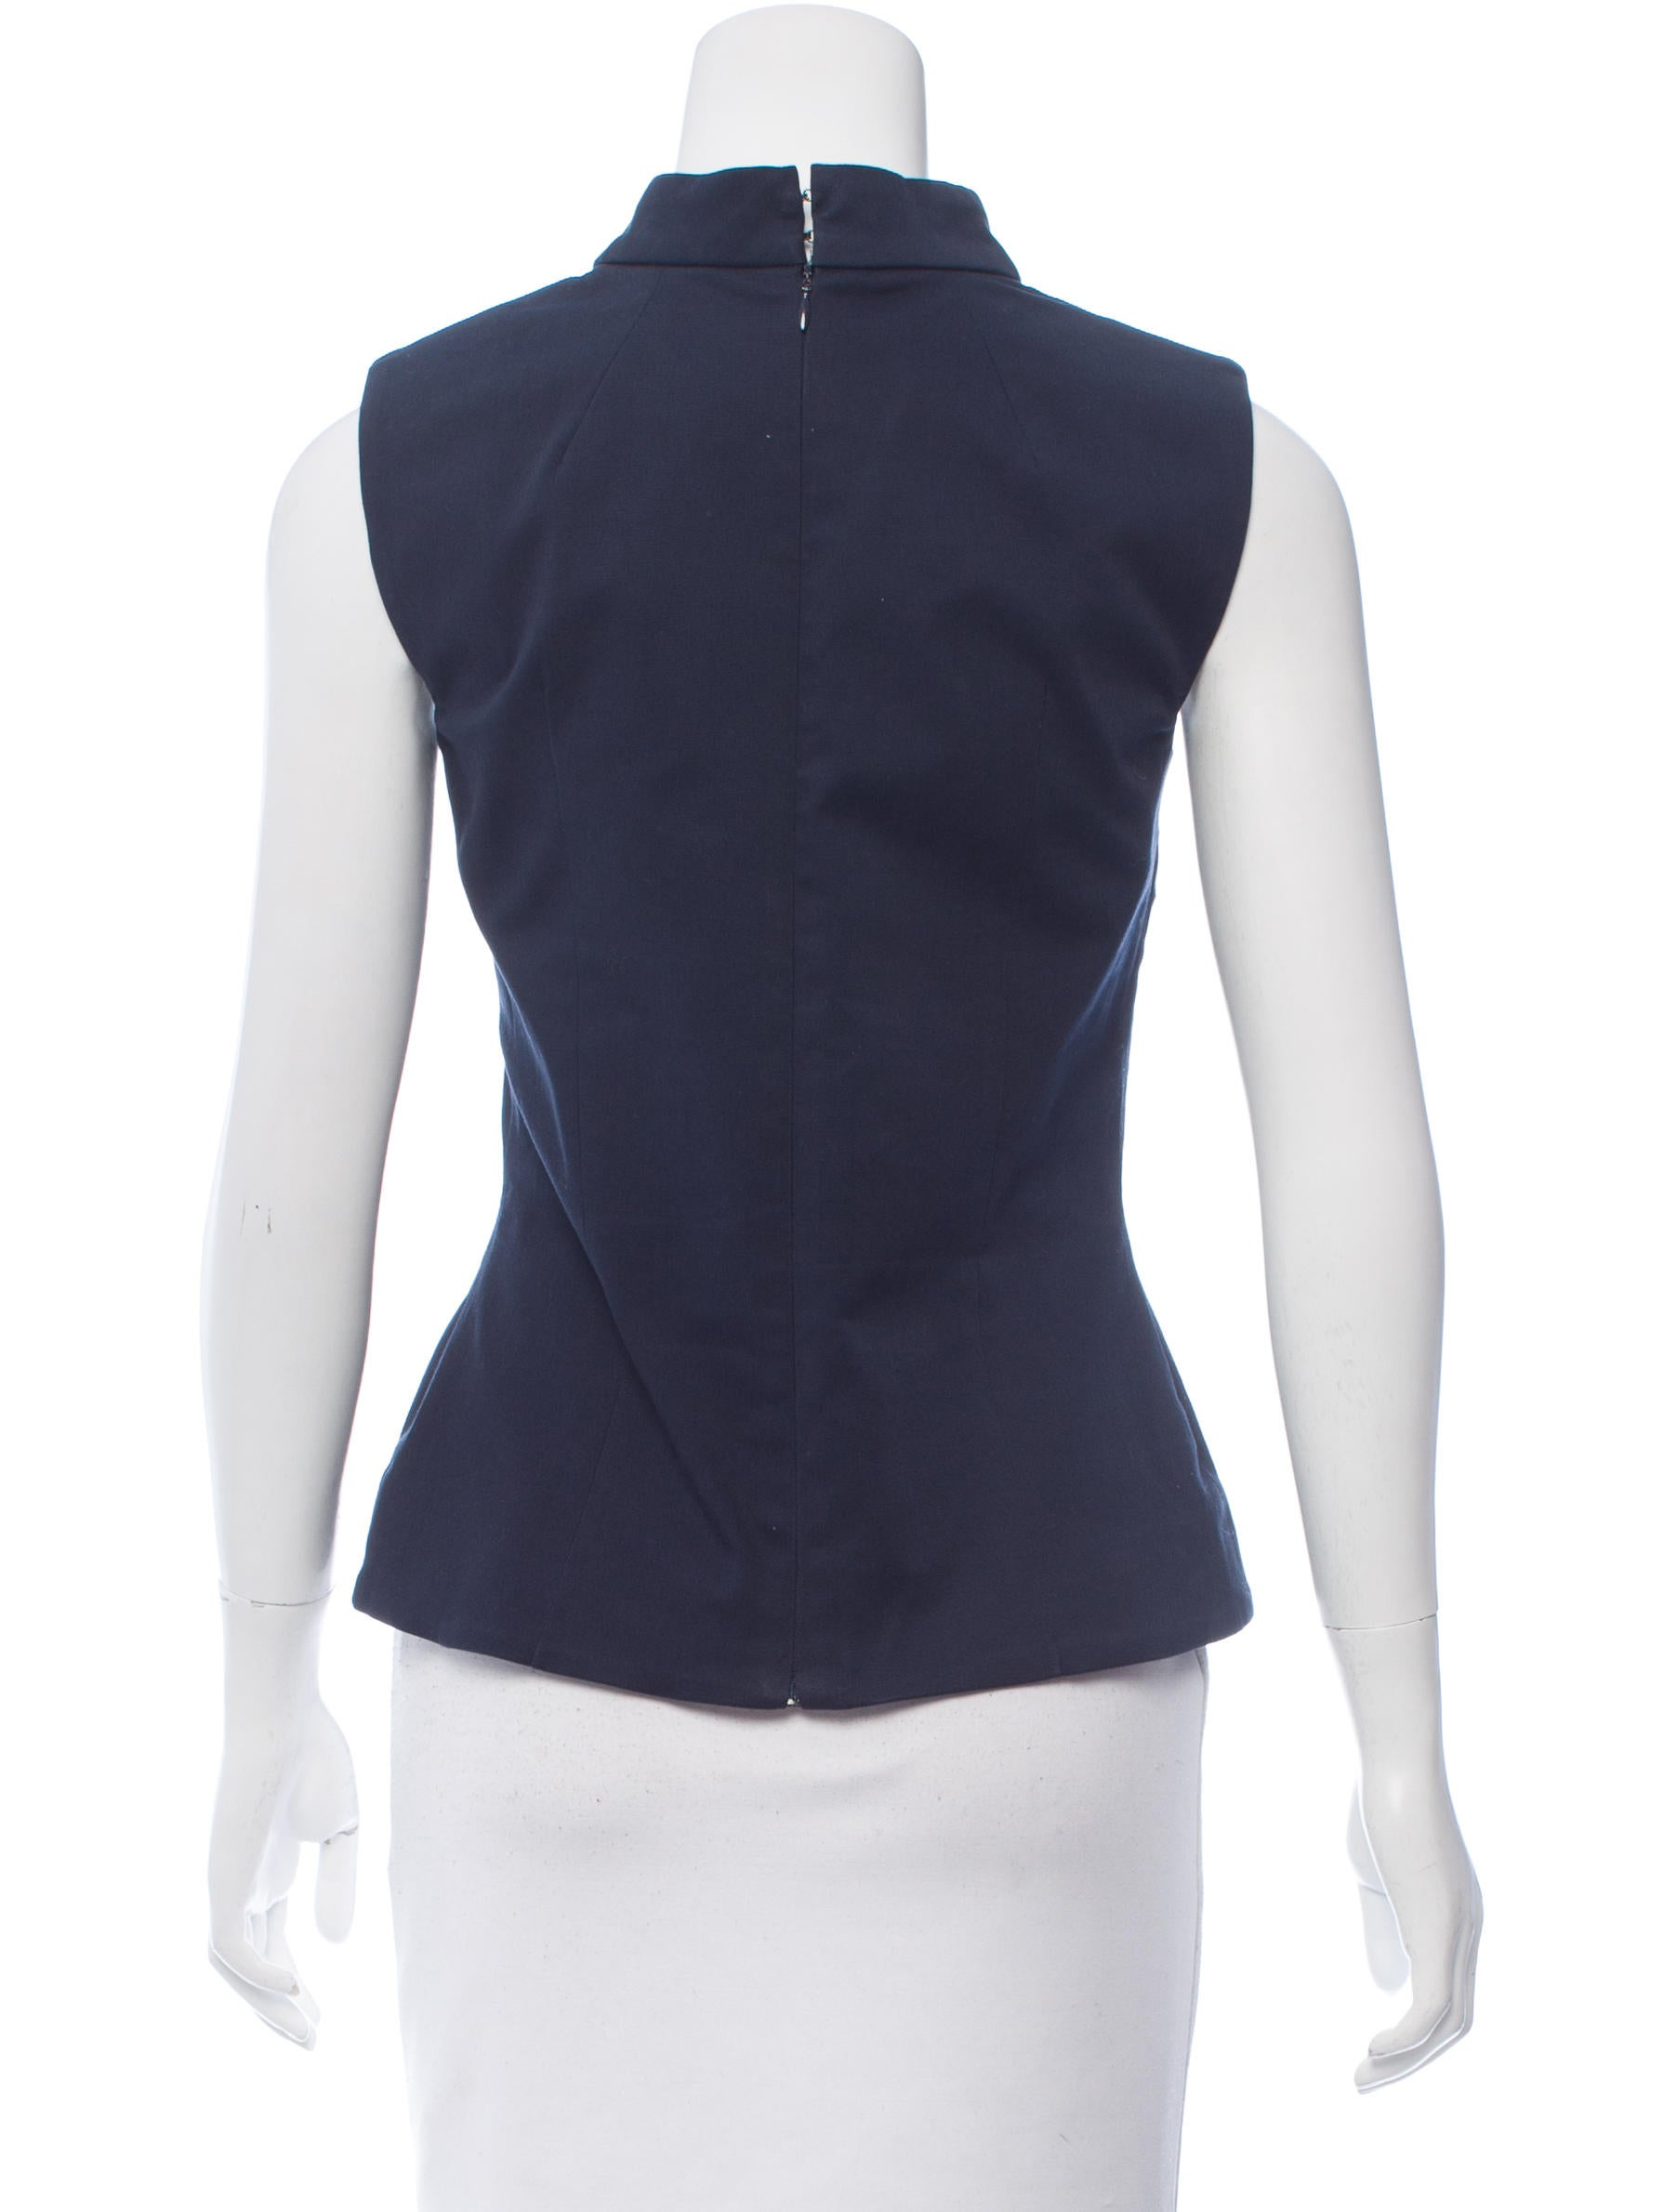 Victoria Beckham Sleeveless Mock Neck Top Clothing